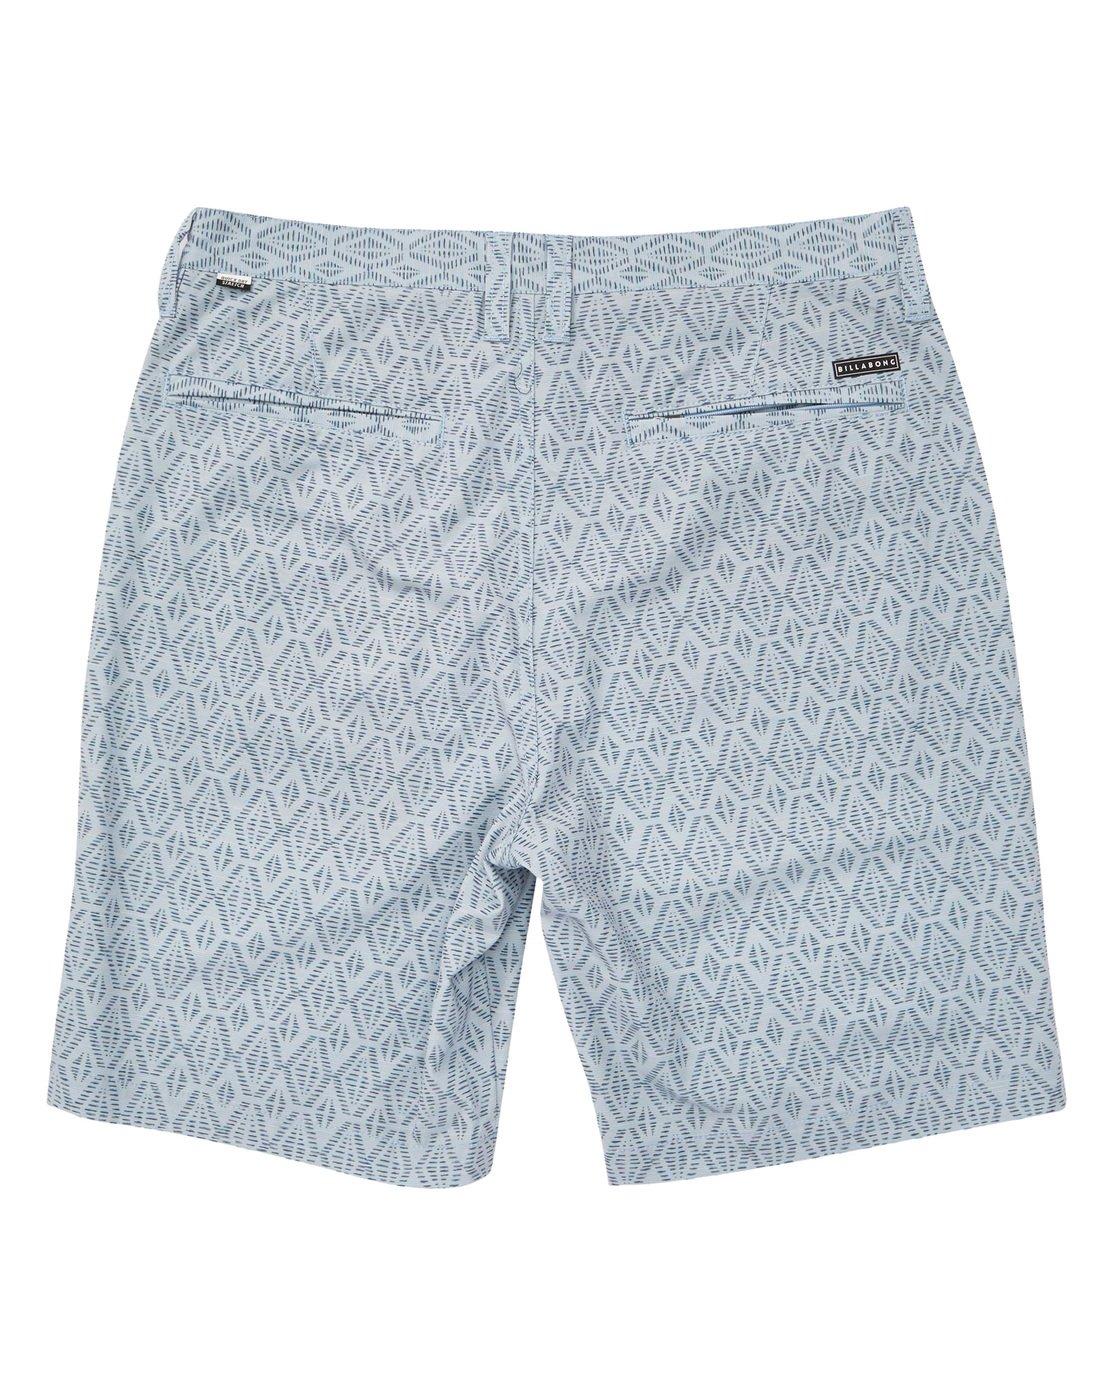 6a91cc4e42 Crossfire X Sundays Shorts